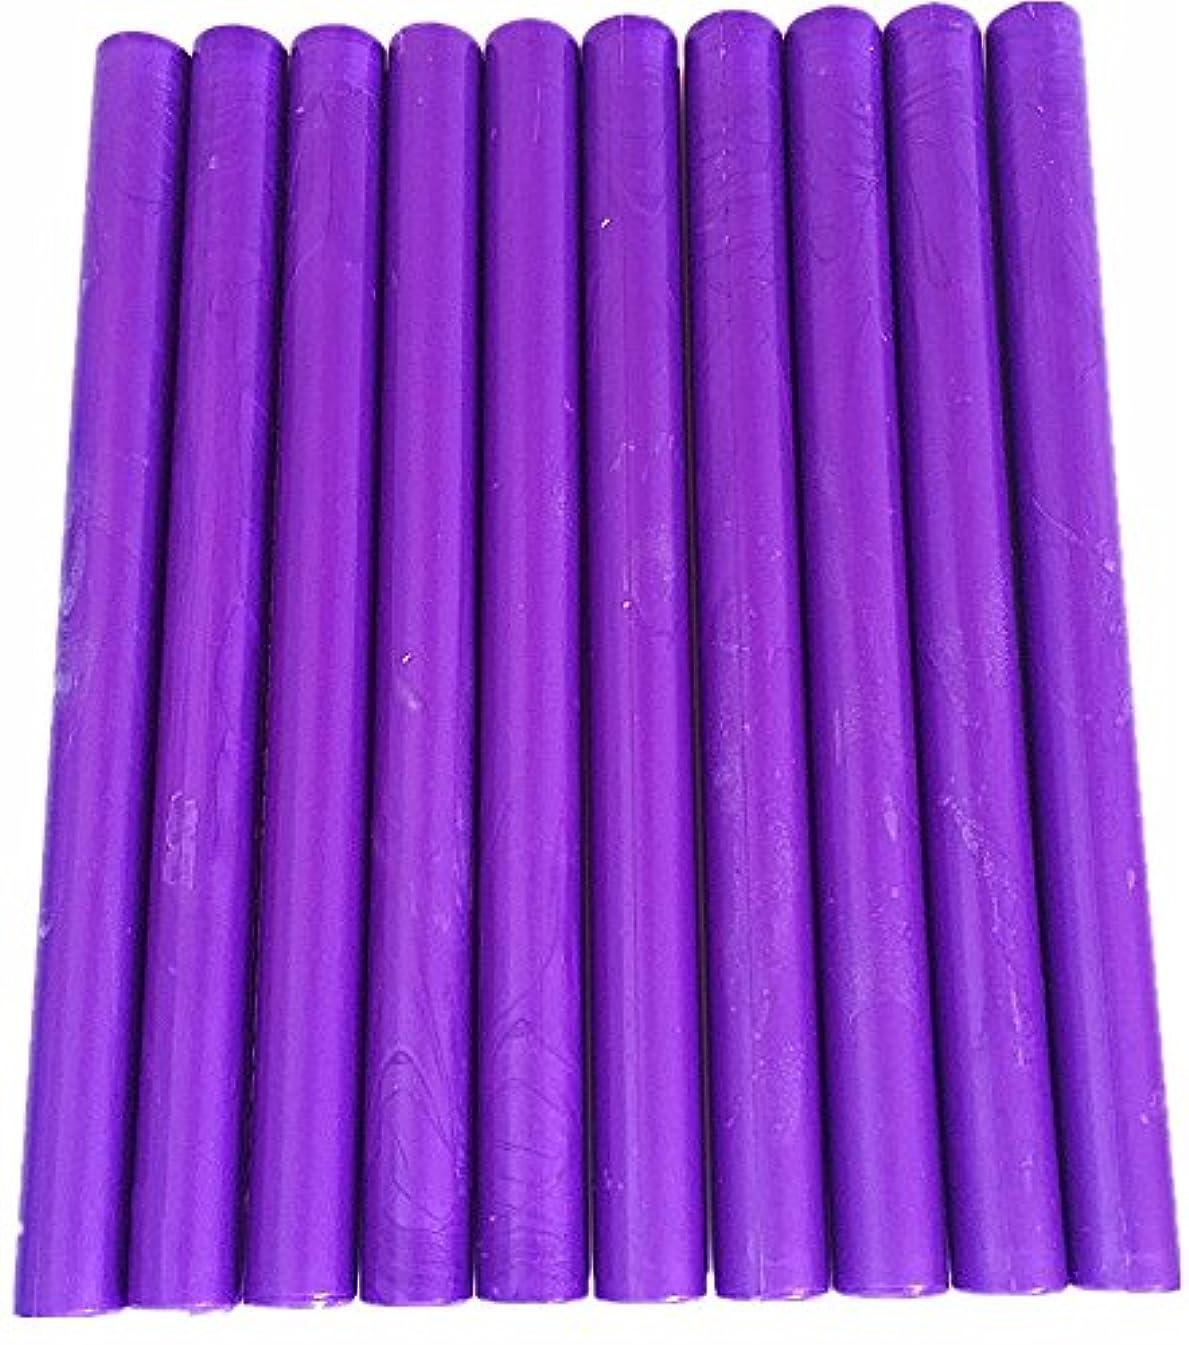 XICHEN10PCS Vintage Sealing Glue Gun Sealing Wax Wax Sticks Wax Seal Supplies a Variety of Colors (Purple)